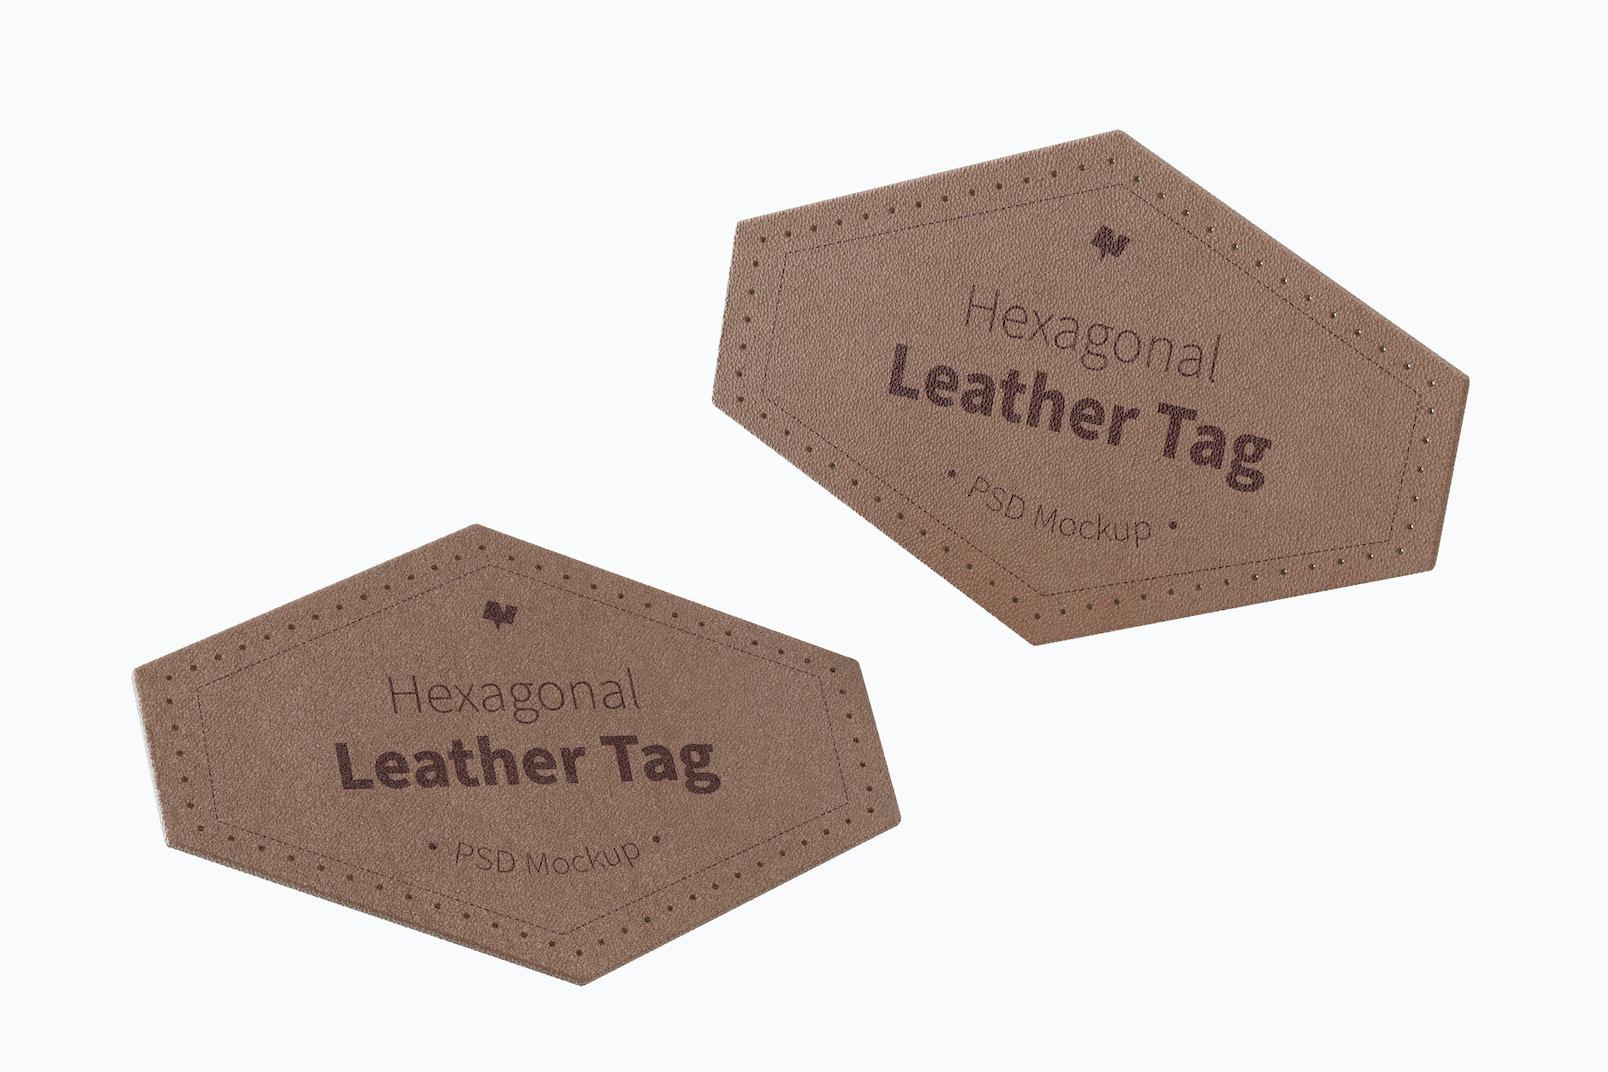 Hexagonal Leather Tags Mockup